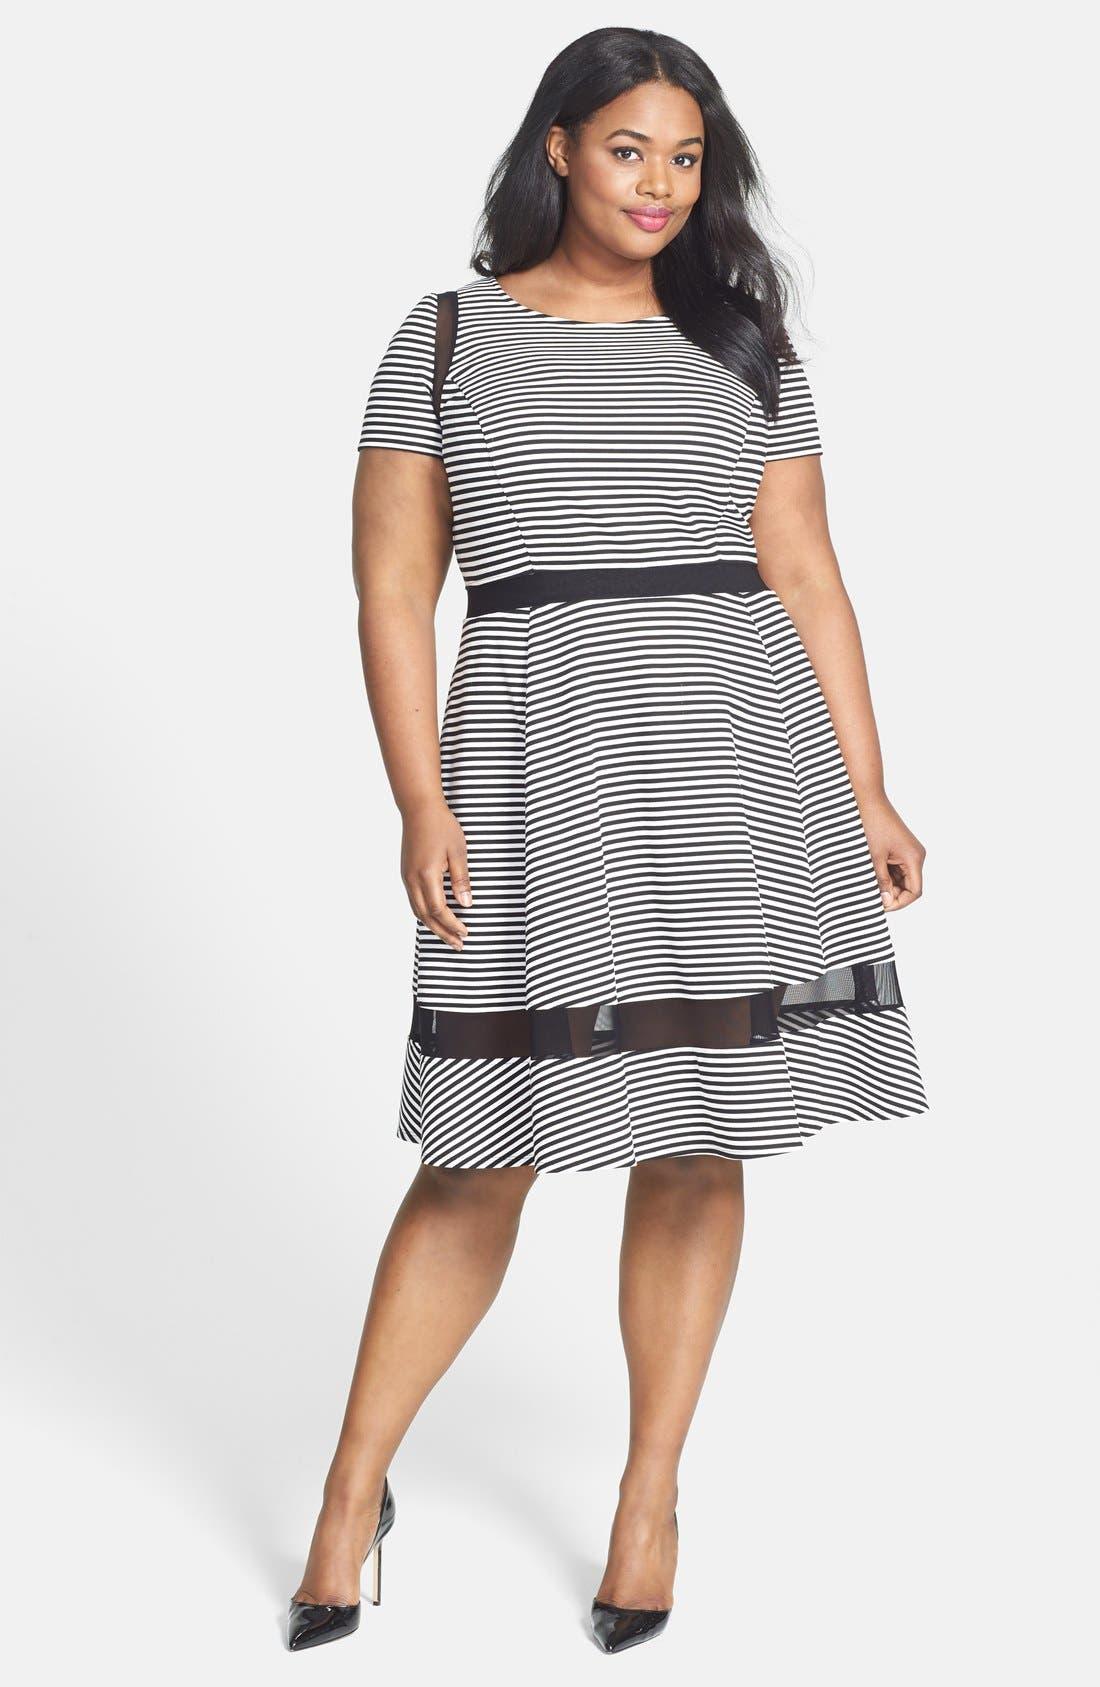 Alternate Image 1 Selected - ABS by Allen Schwartz Mesh Inset Stripe Fit & Flare Dress (Plus Size)